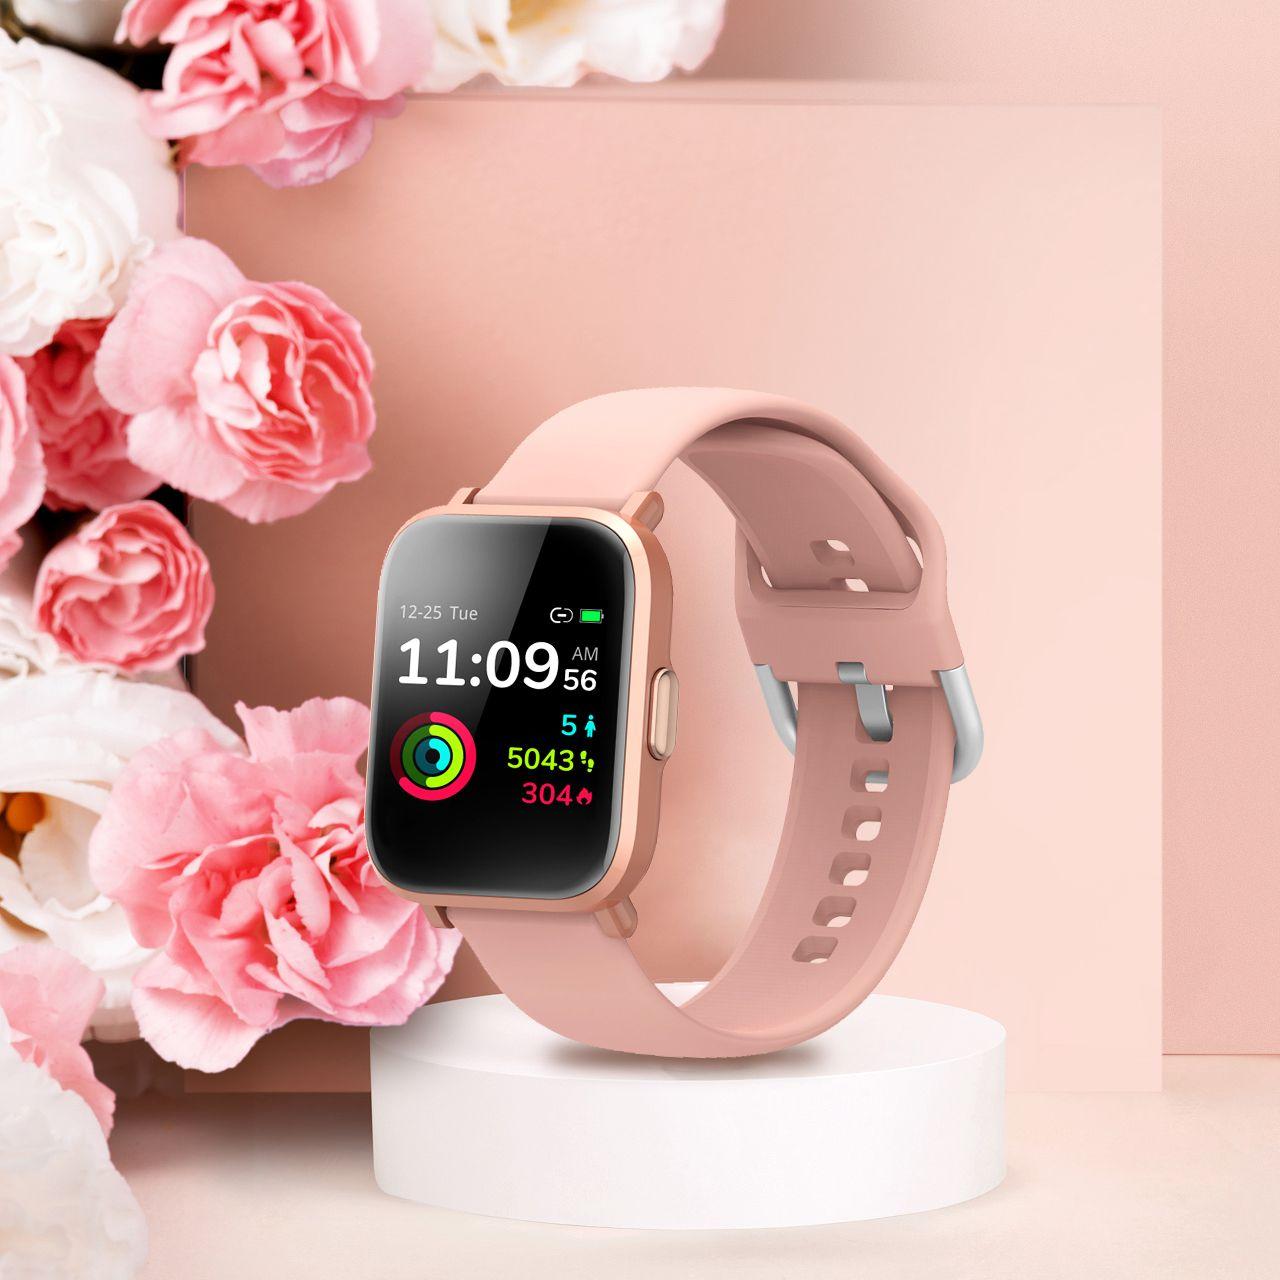 7e89676a22981ed4f5ee90f4814b2f59 Smartwatch Cs201